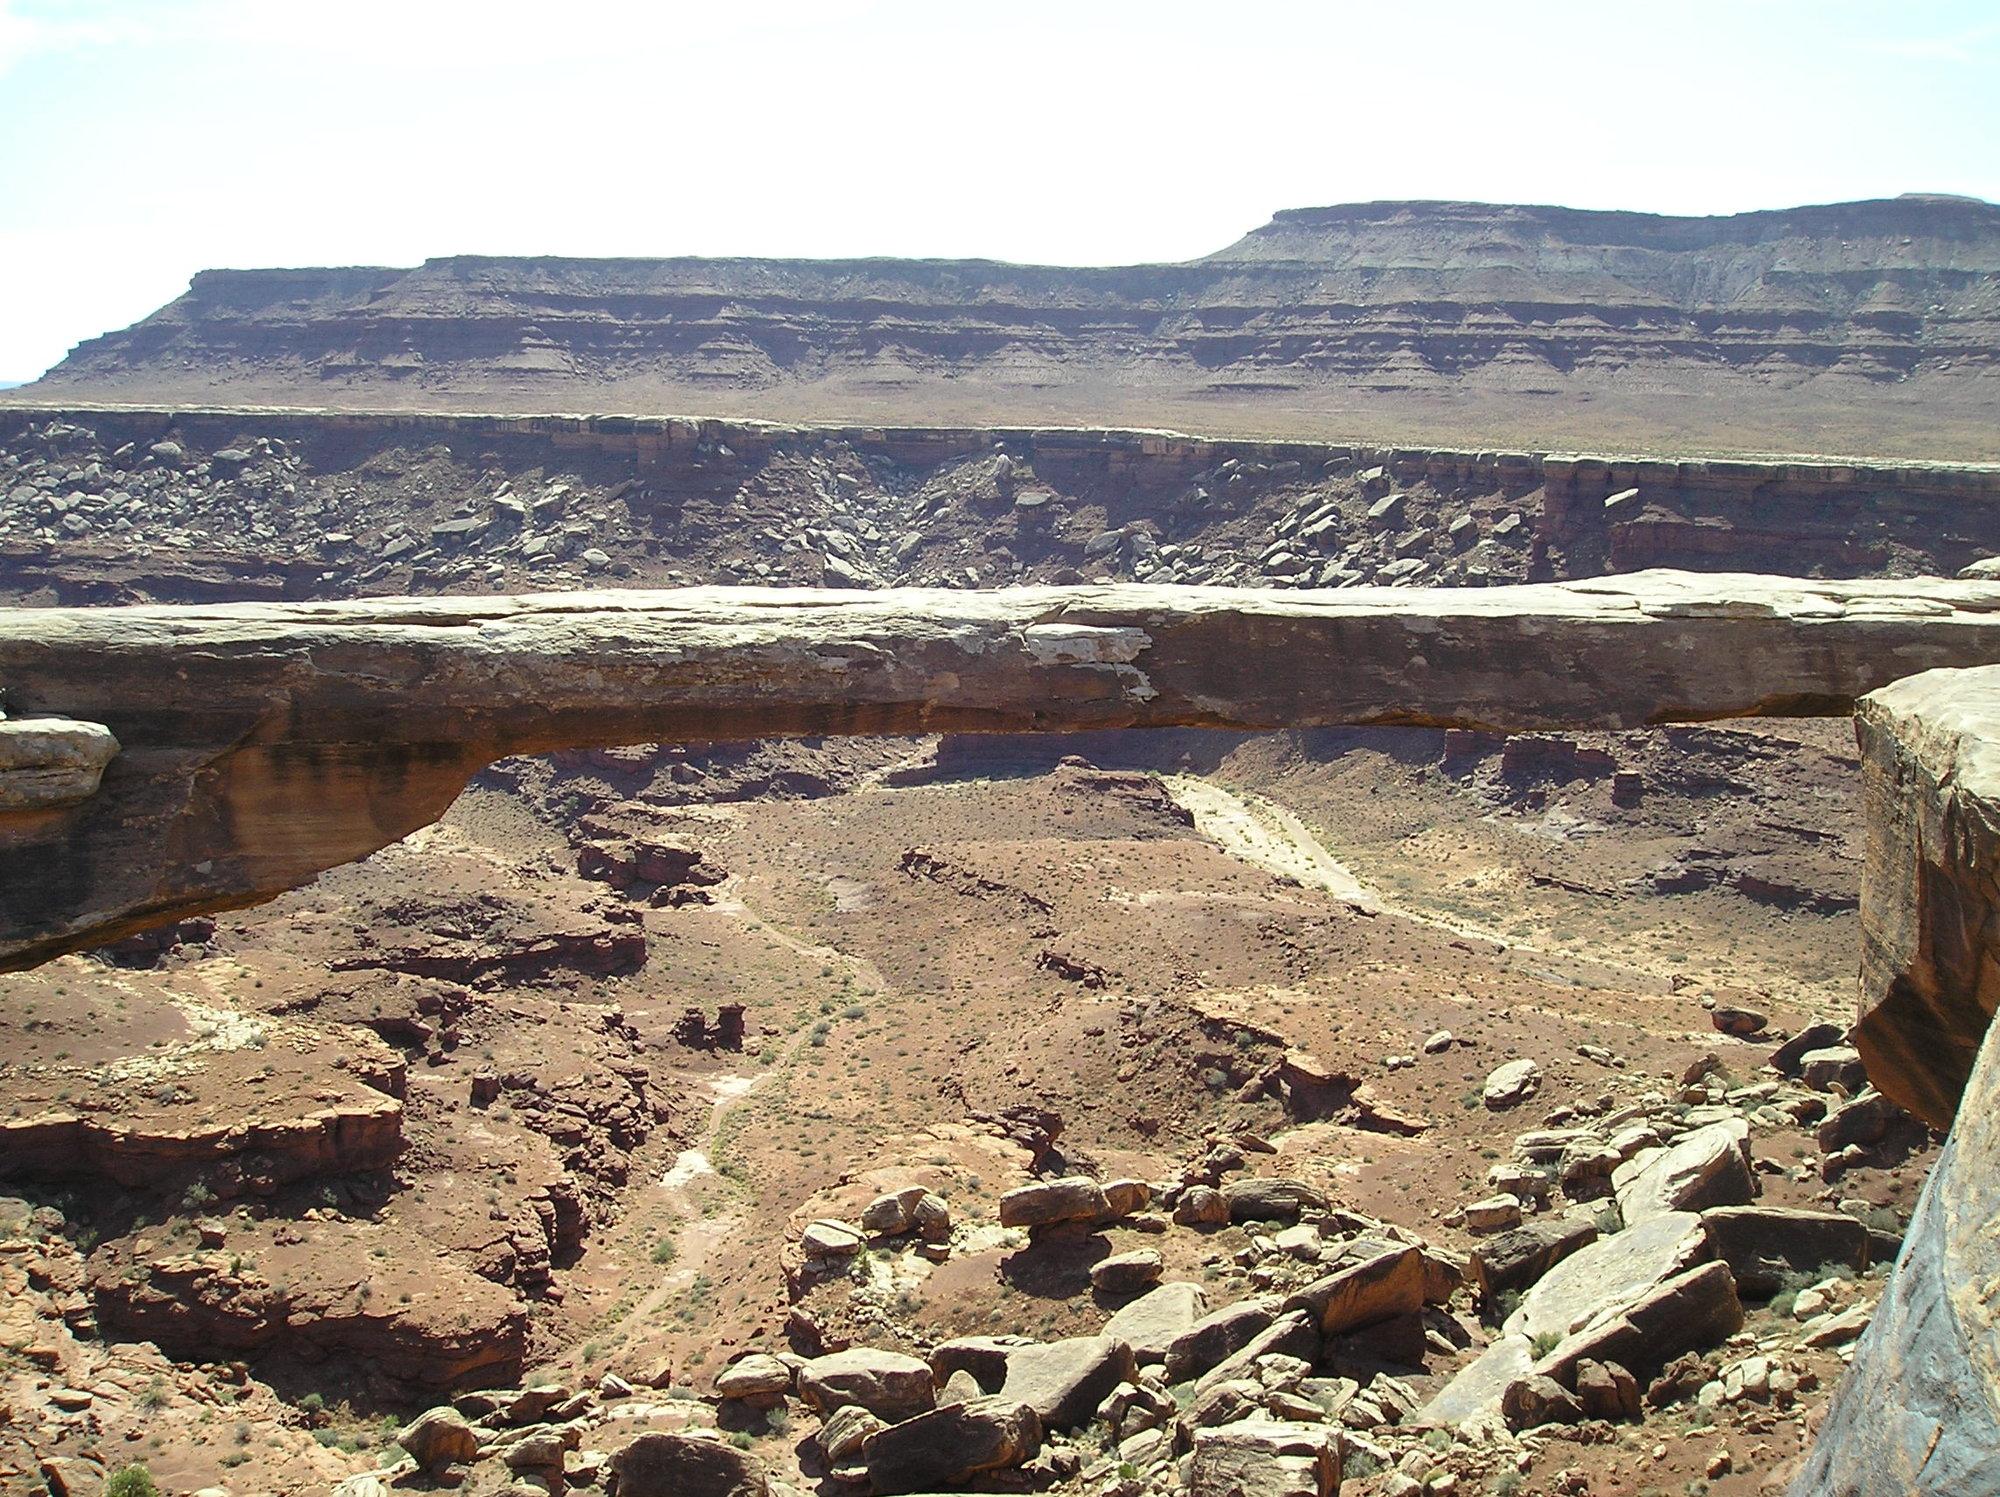 Moab Oct 2012 029.JPG